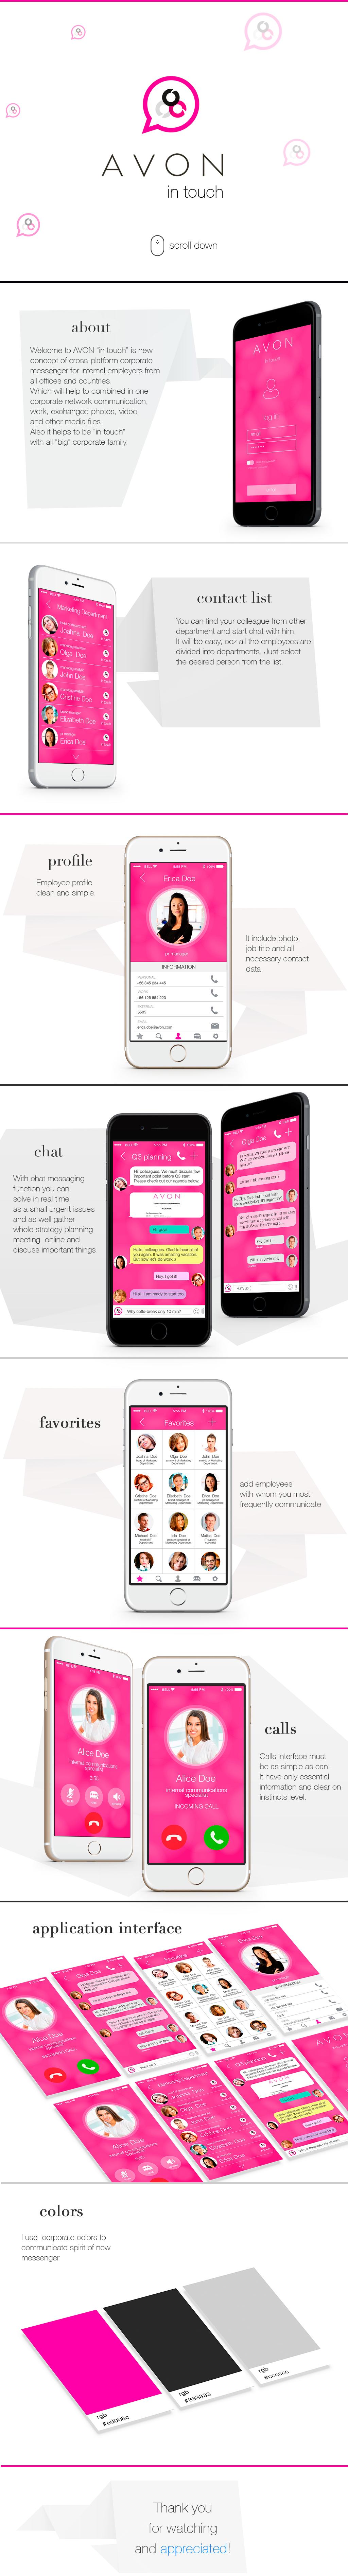 messenger corporate messenger Avon ui design app app design application Application Design intouch avon in touch app concept sketch WhatsApp message social network